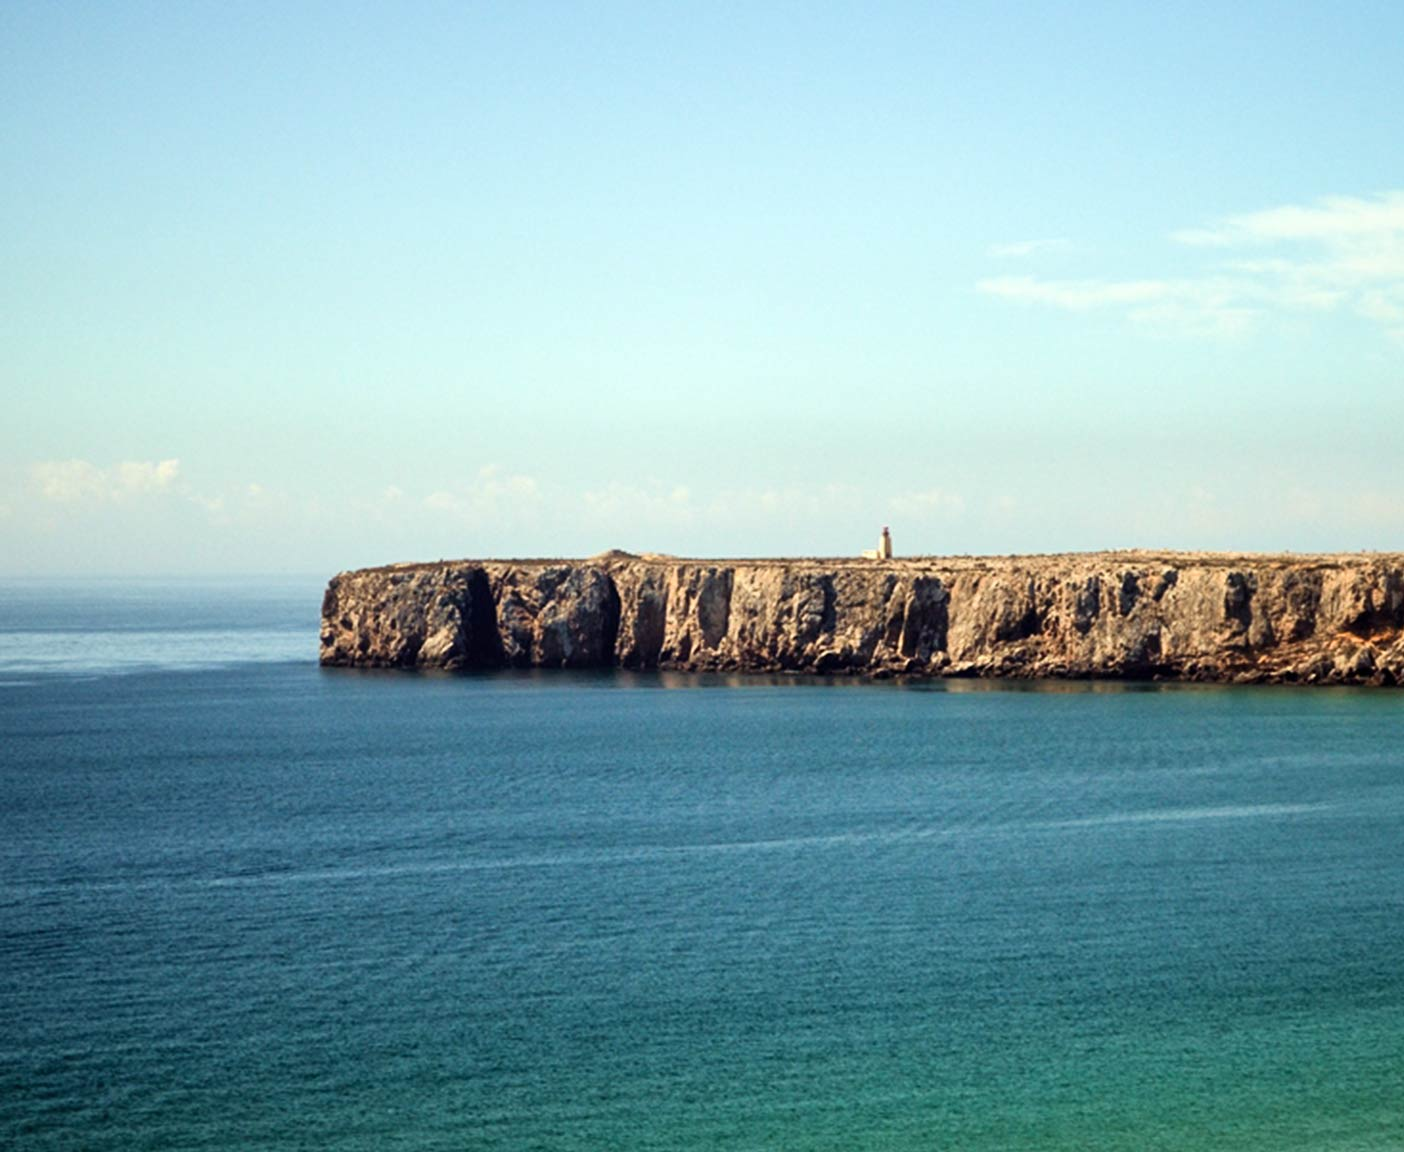 Felsen und Leuchtturm in Sagres Algarve Portugal Reisefotografie Paulcamper